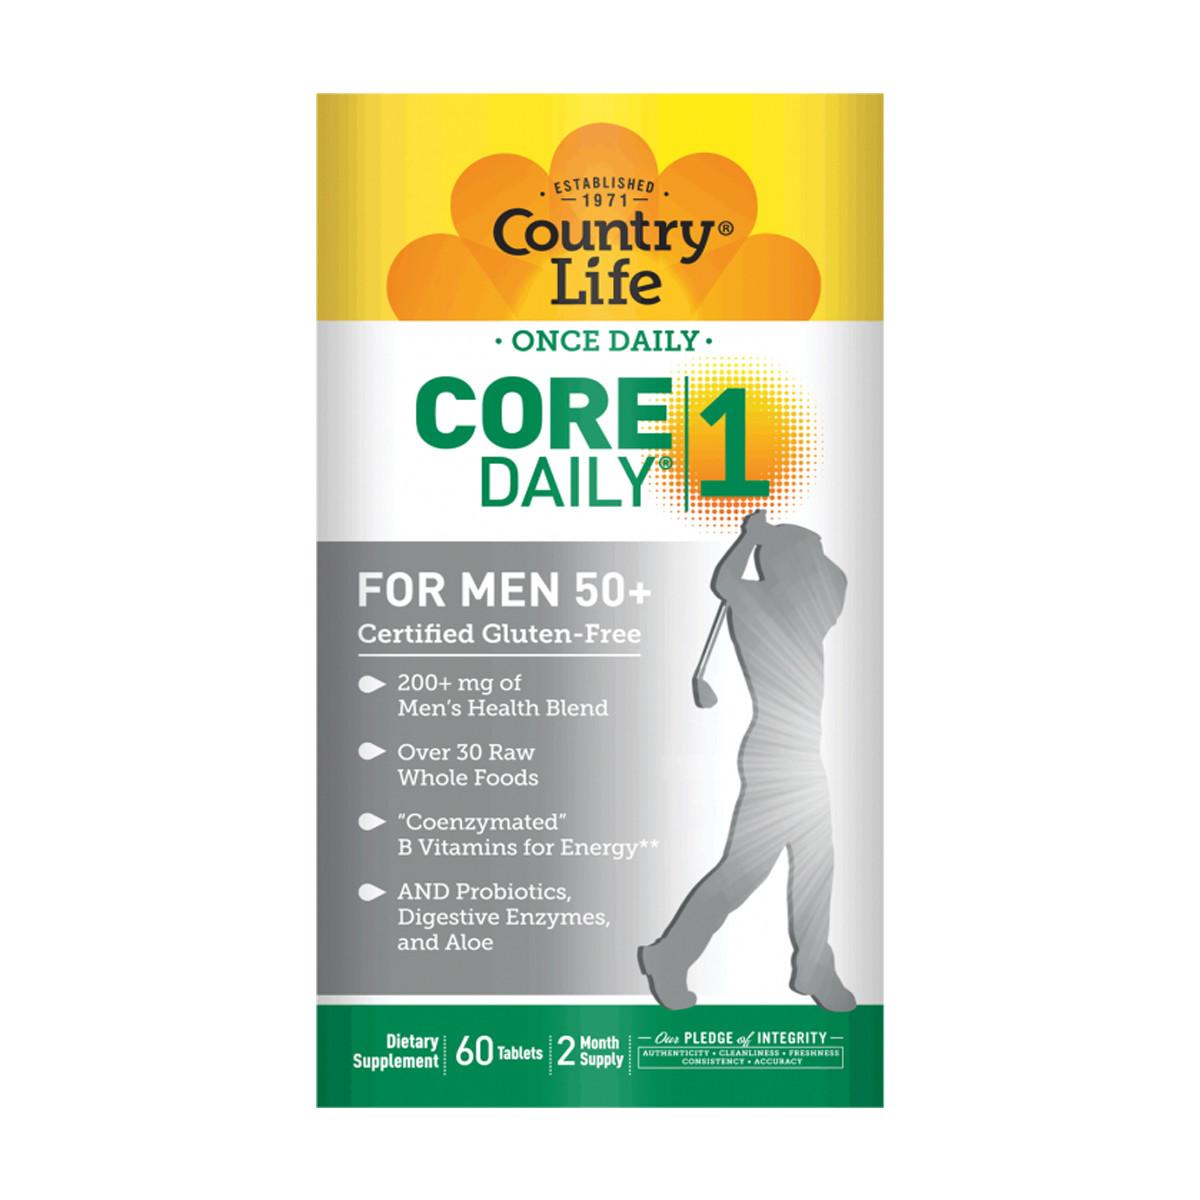 Мультивитамины для Мужчин, 50+, Core Daily-1 for Men 50+, Country Life, 60 таблеток